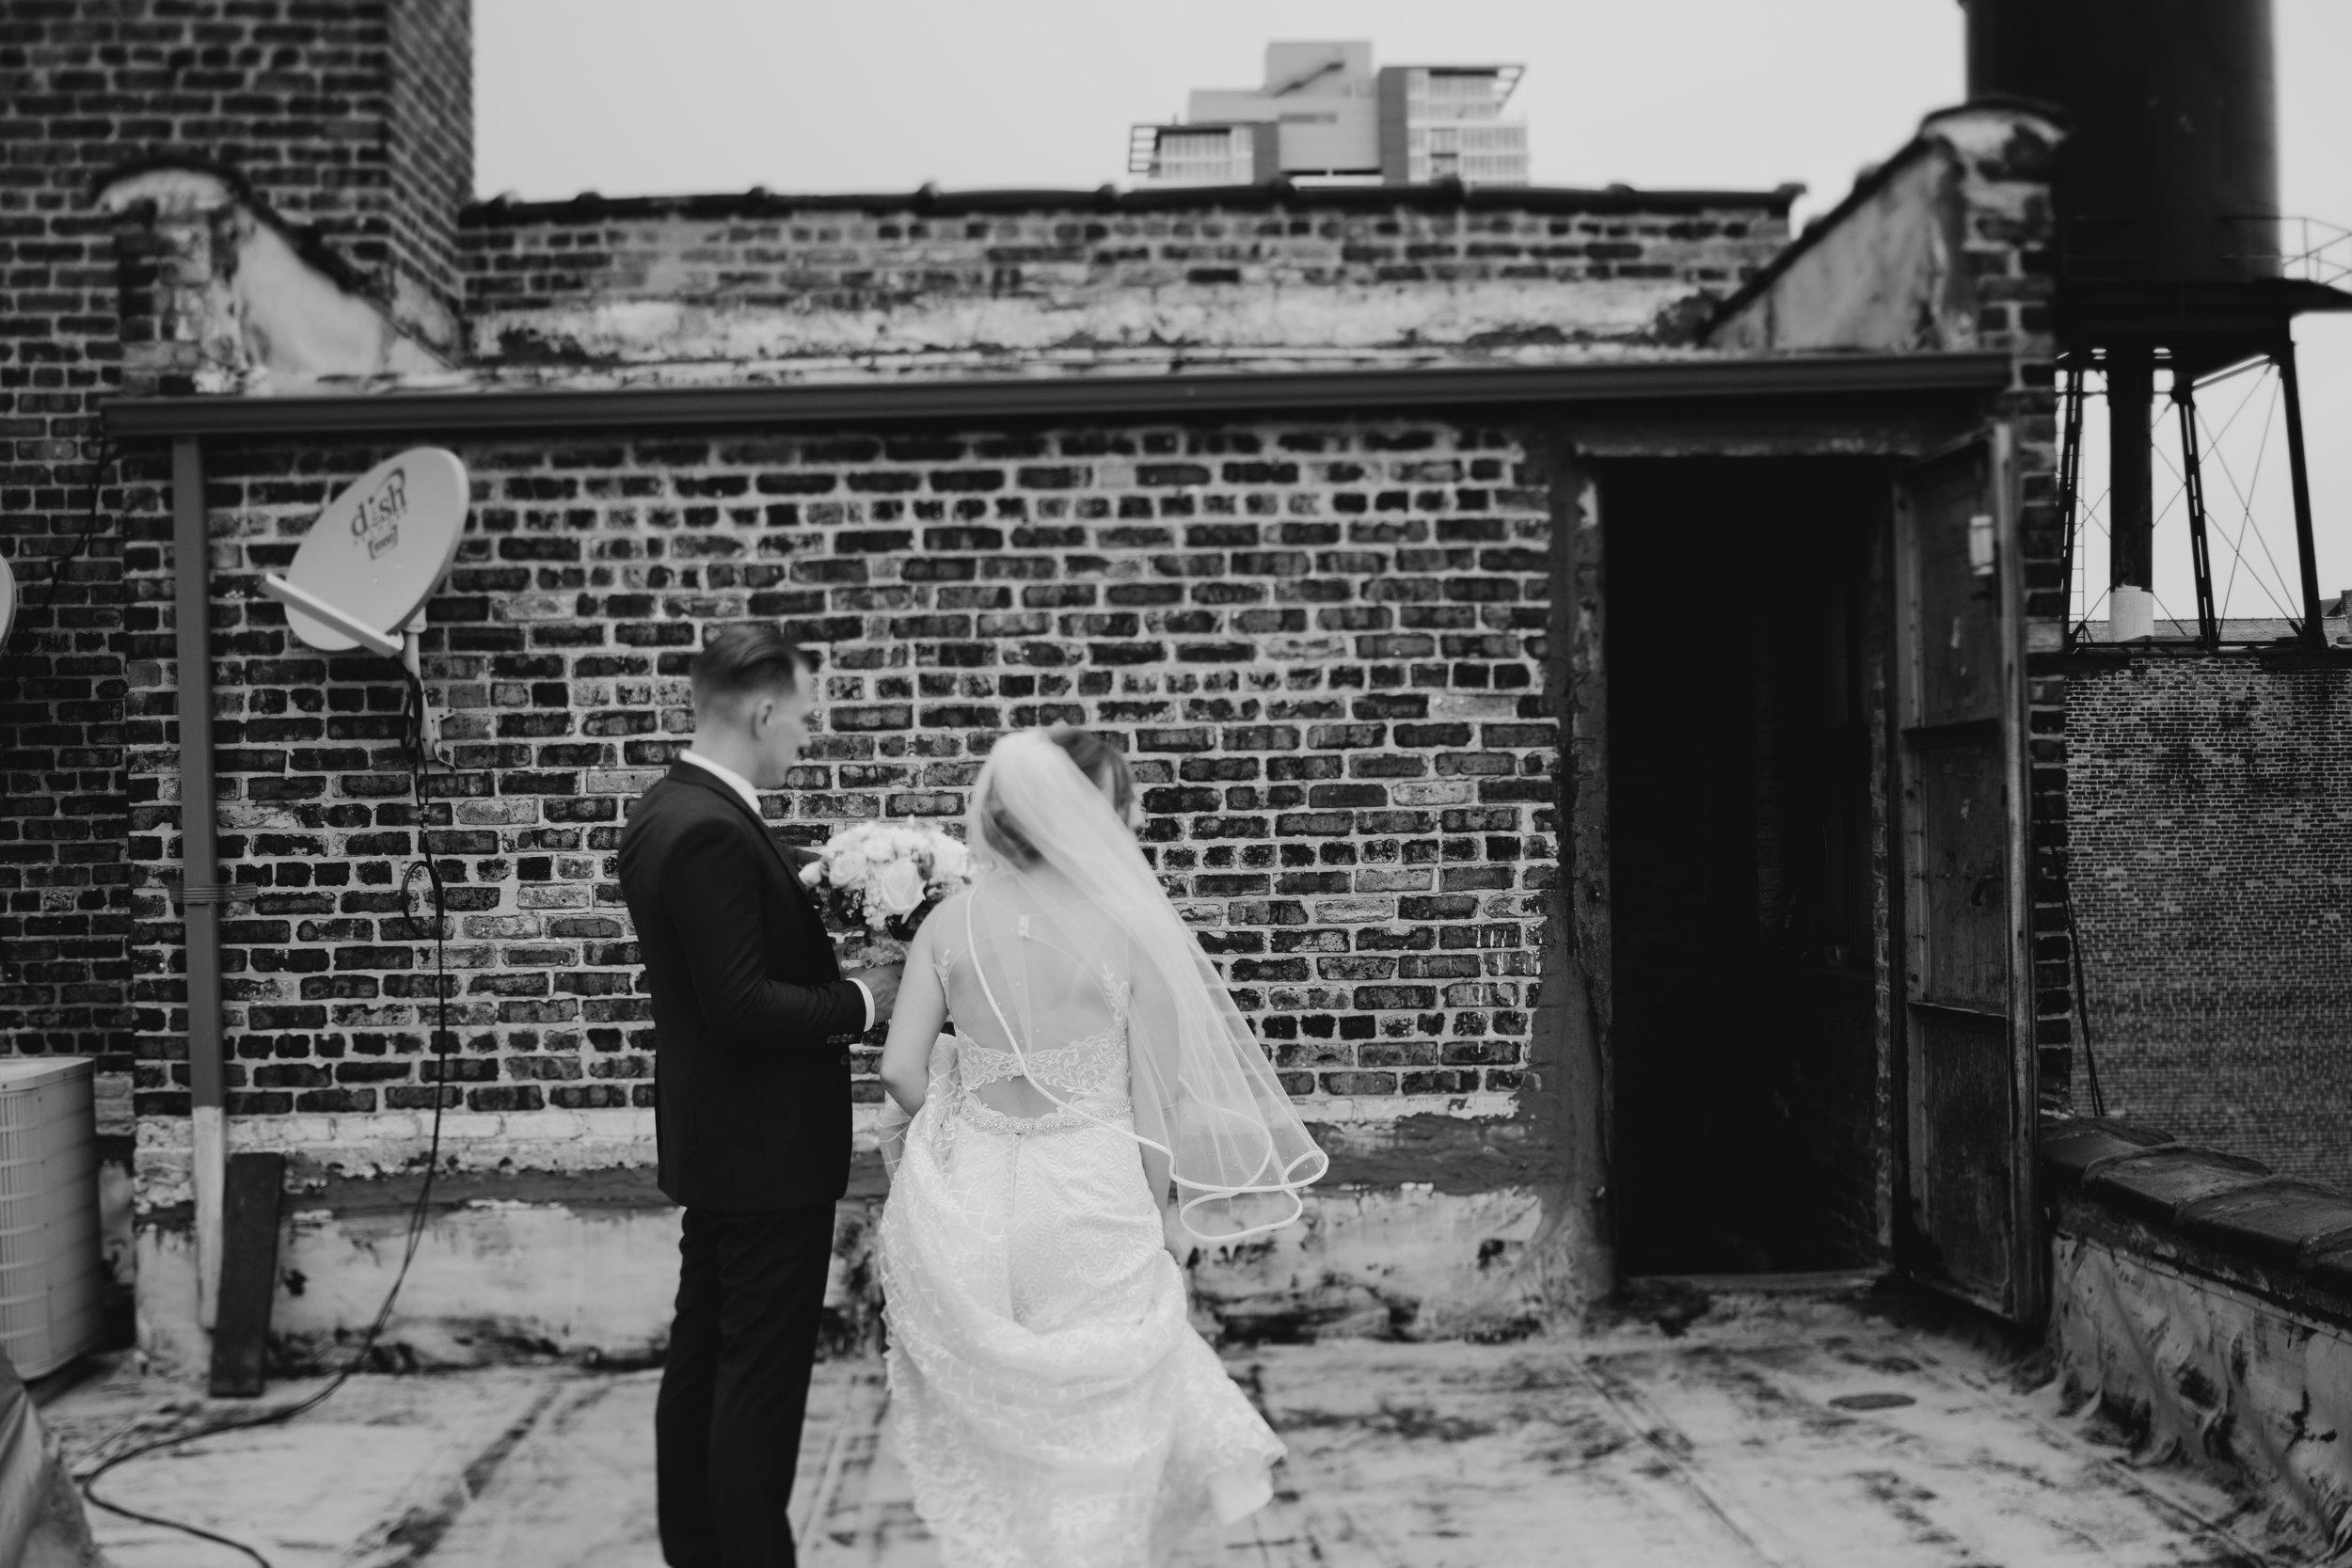 Vintage Wedding_Polly C Photography_20171726184100.jpg